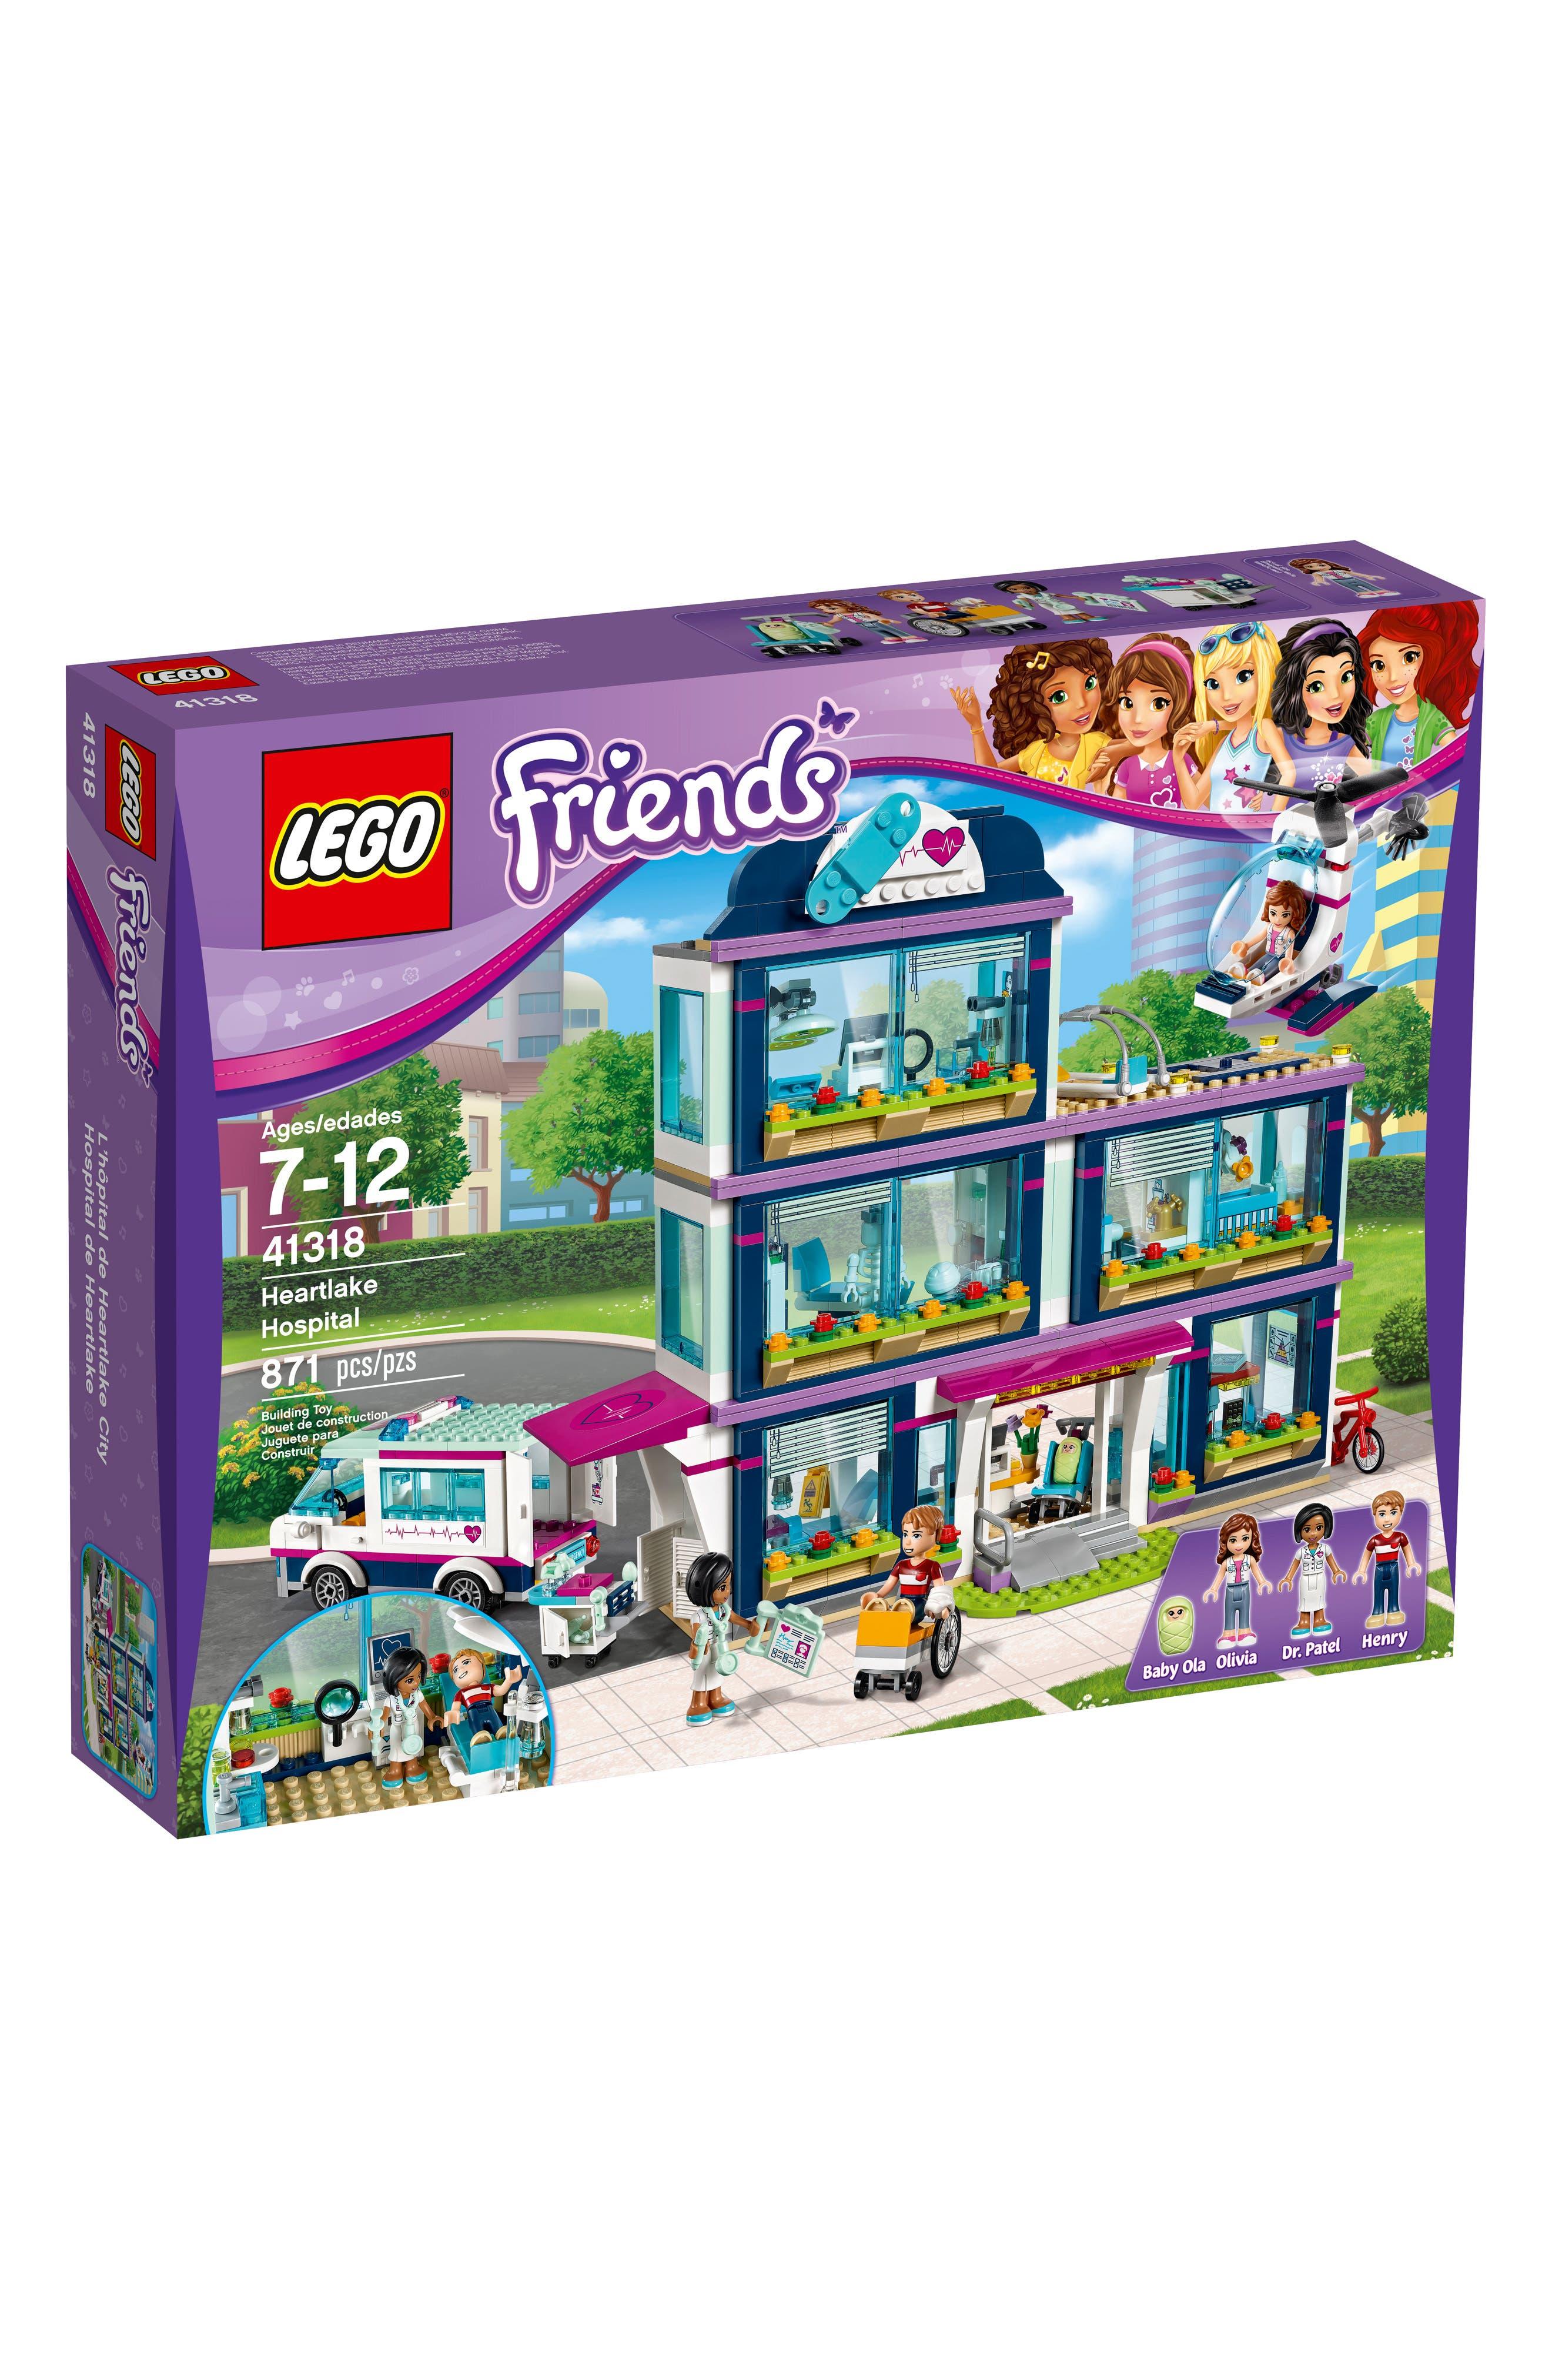 Friends Heartlake Hospital Play Set - 41318,                         Main,                         color, 400